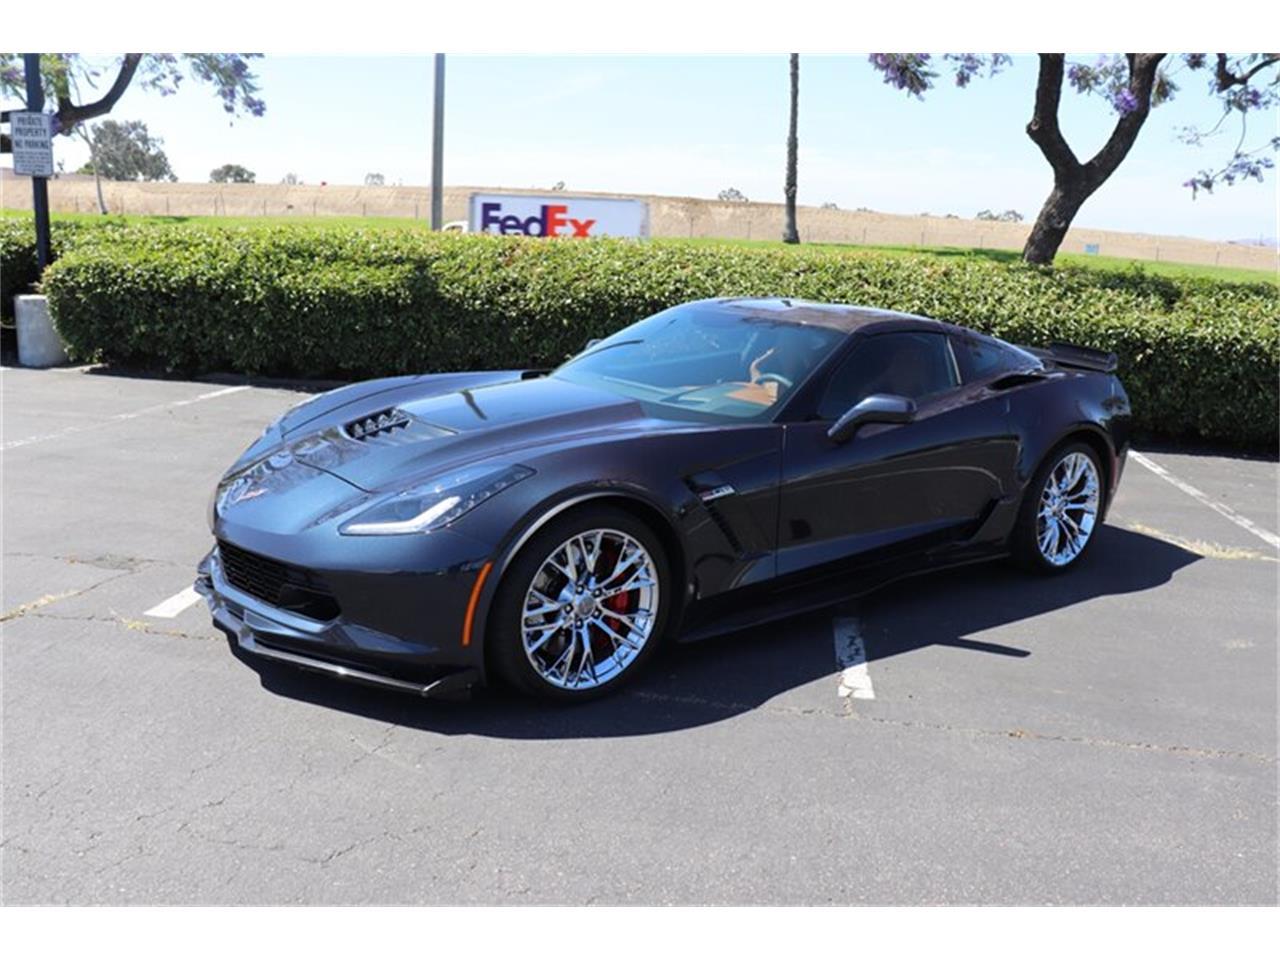 Large Picture of '15 Chevrolet Corvette Z06 located in California - $59,995.00 - QFLK